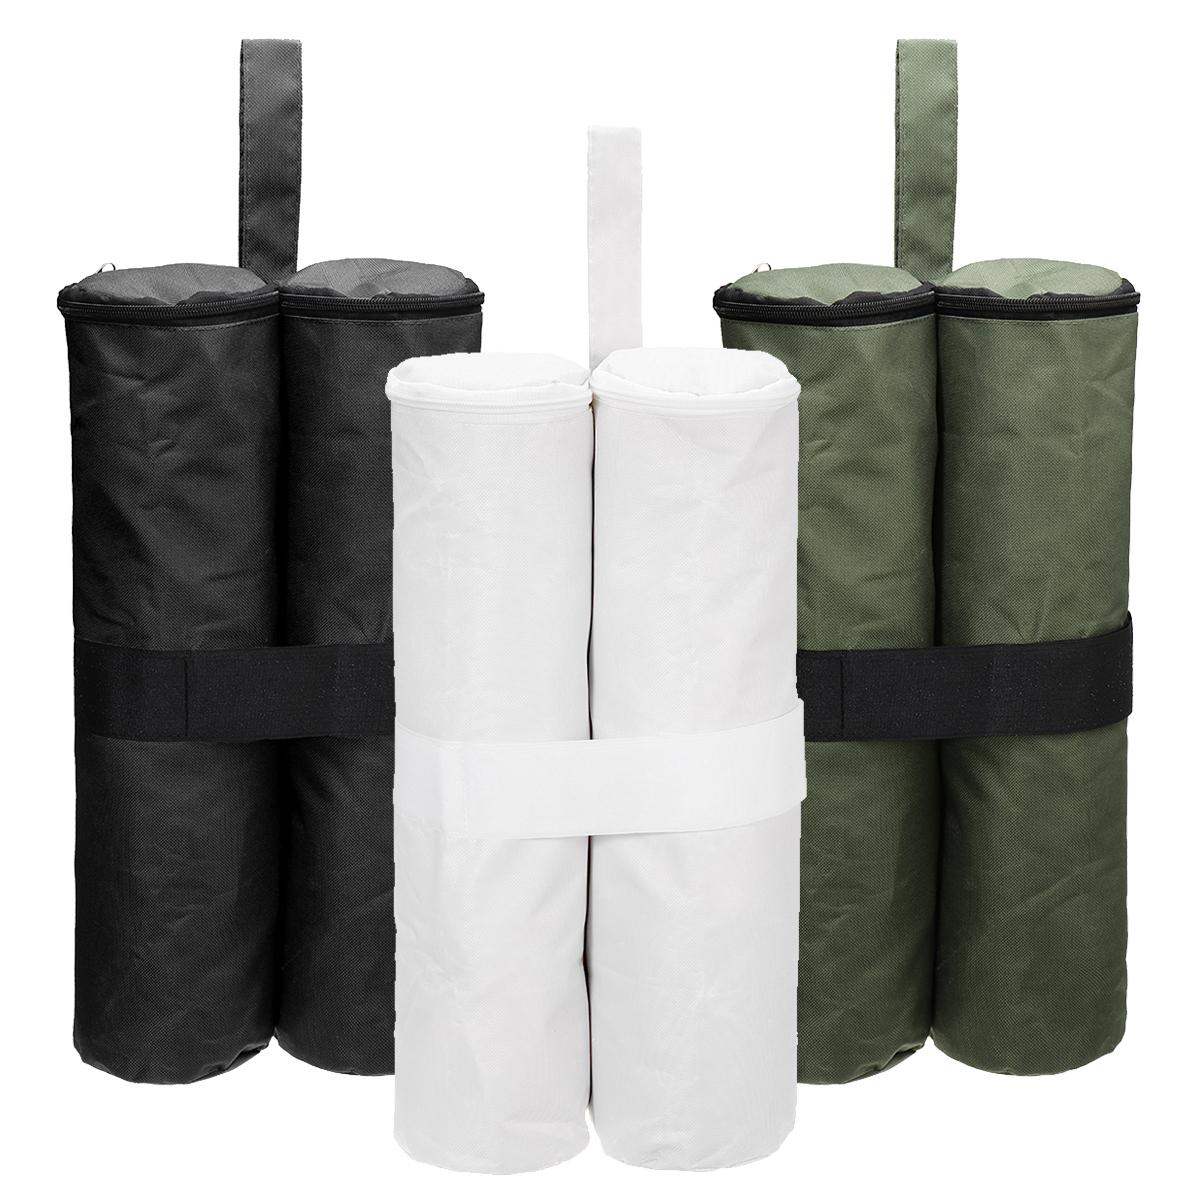 Outdoor Camping Tent Sunshade Canopy 4 Leg Weight Sand Bag Gazebo 600D Oxford Windproof Fixing Sandbag